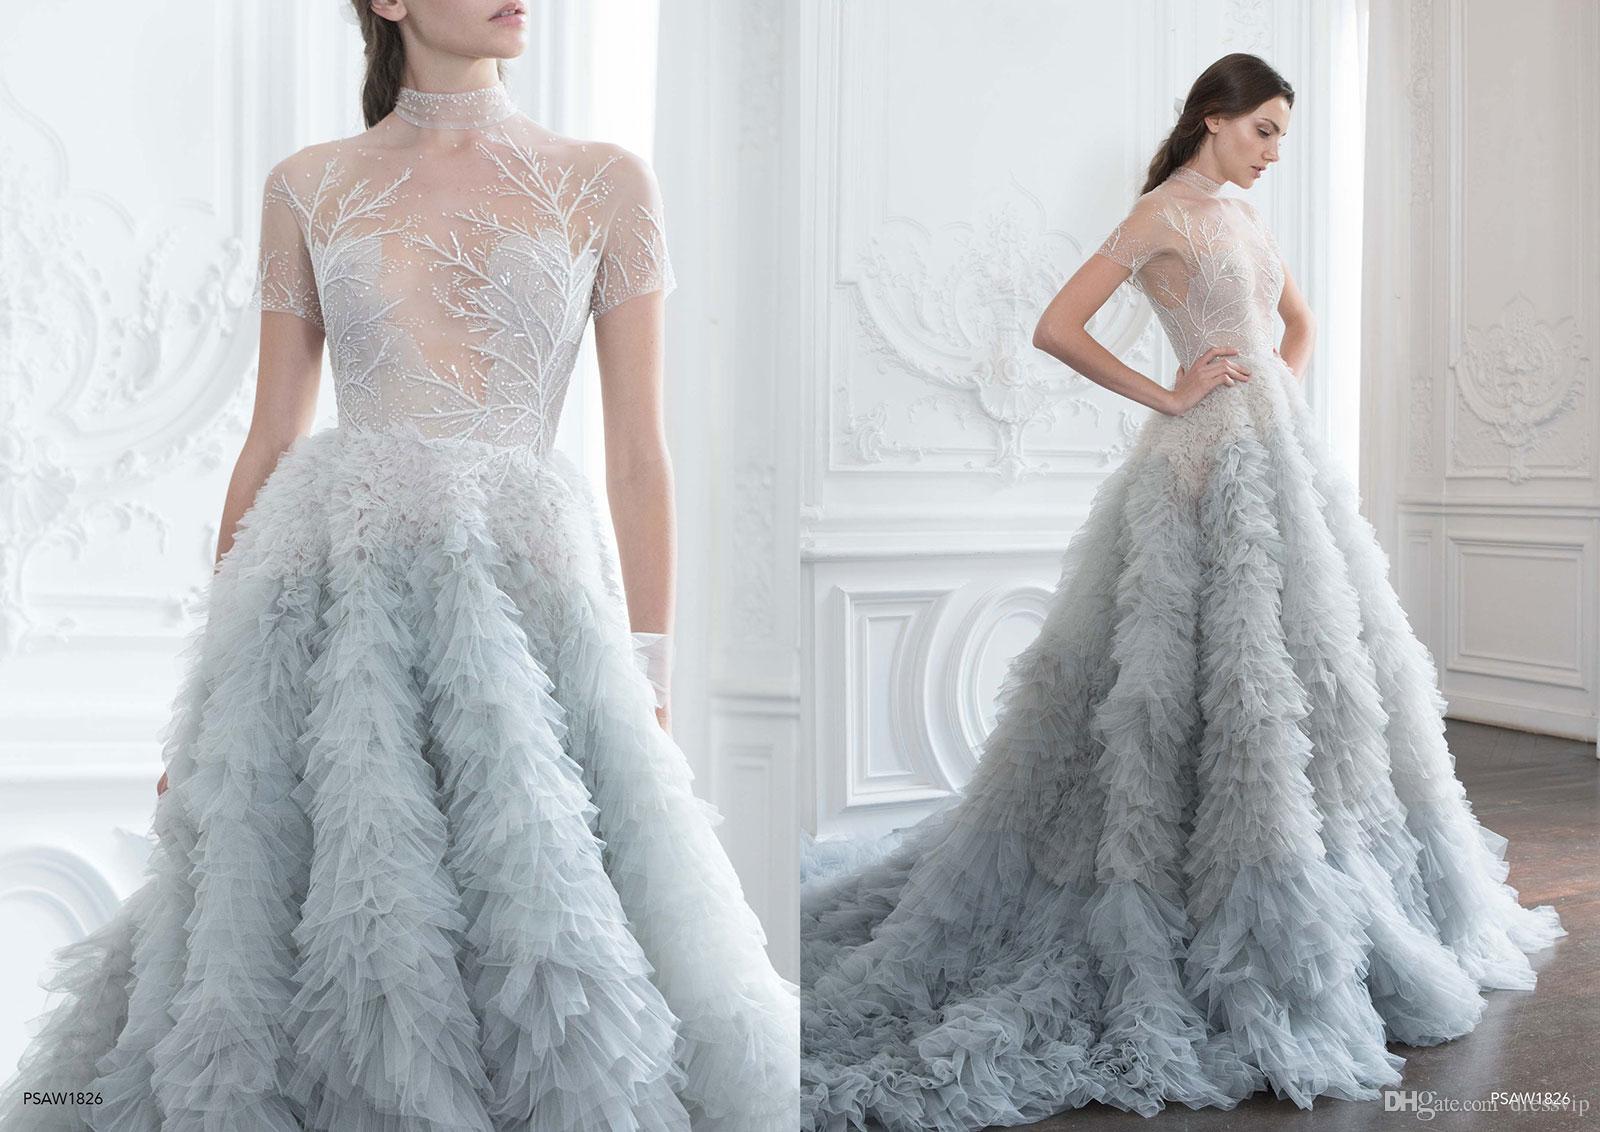 New arrival paolo sebastian prom dresses high neck short sleeves